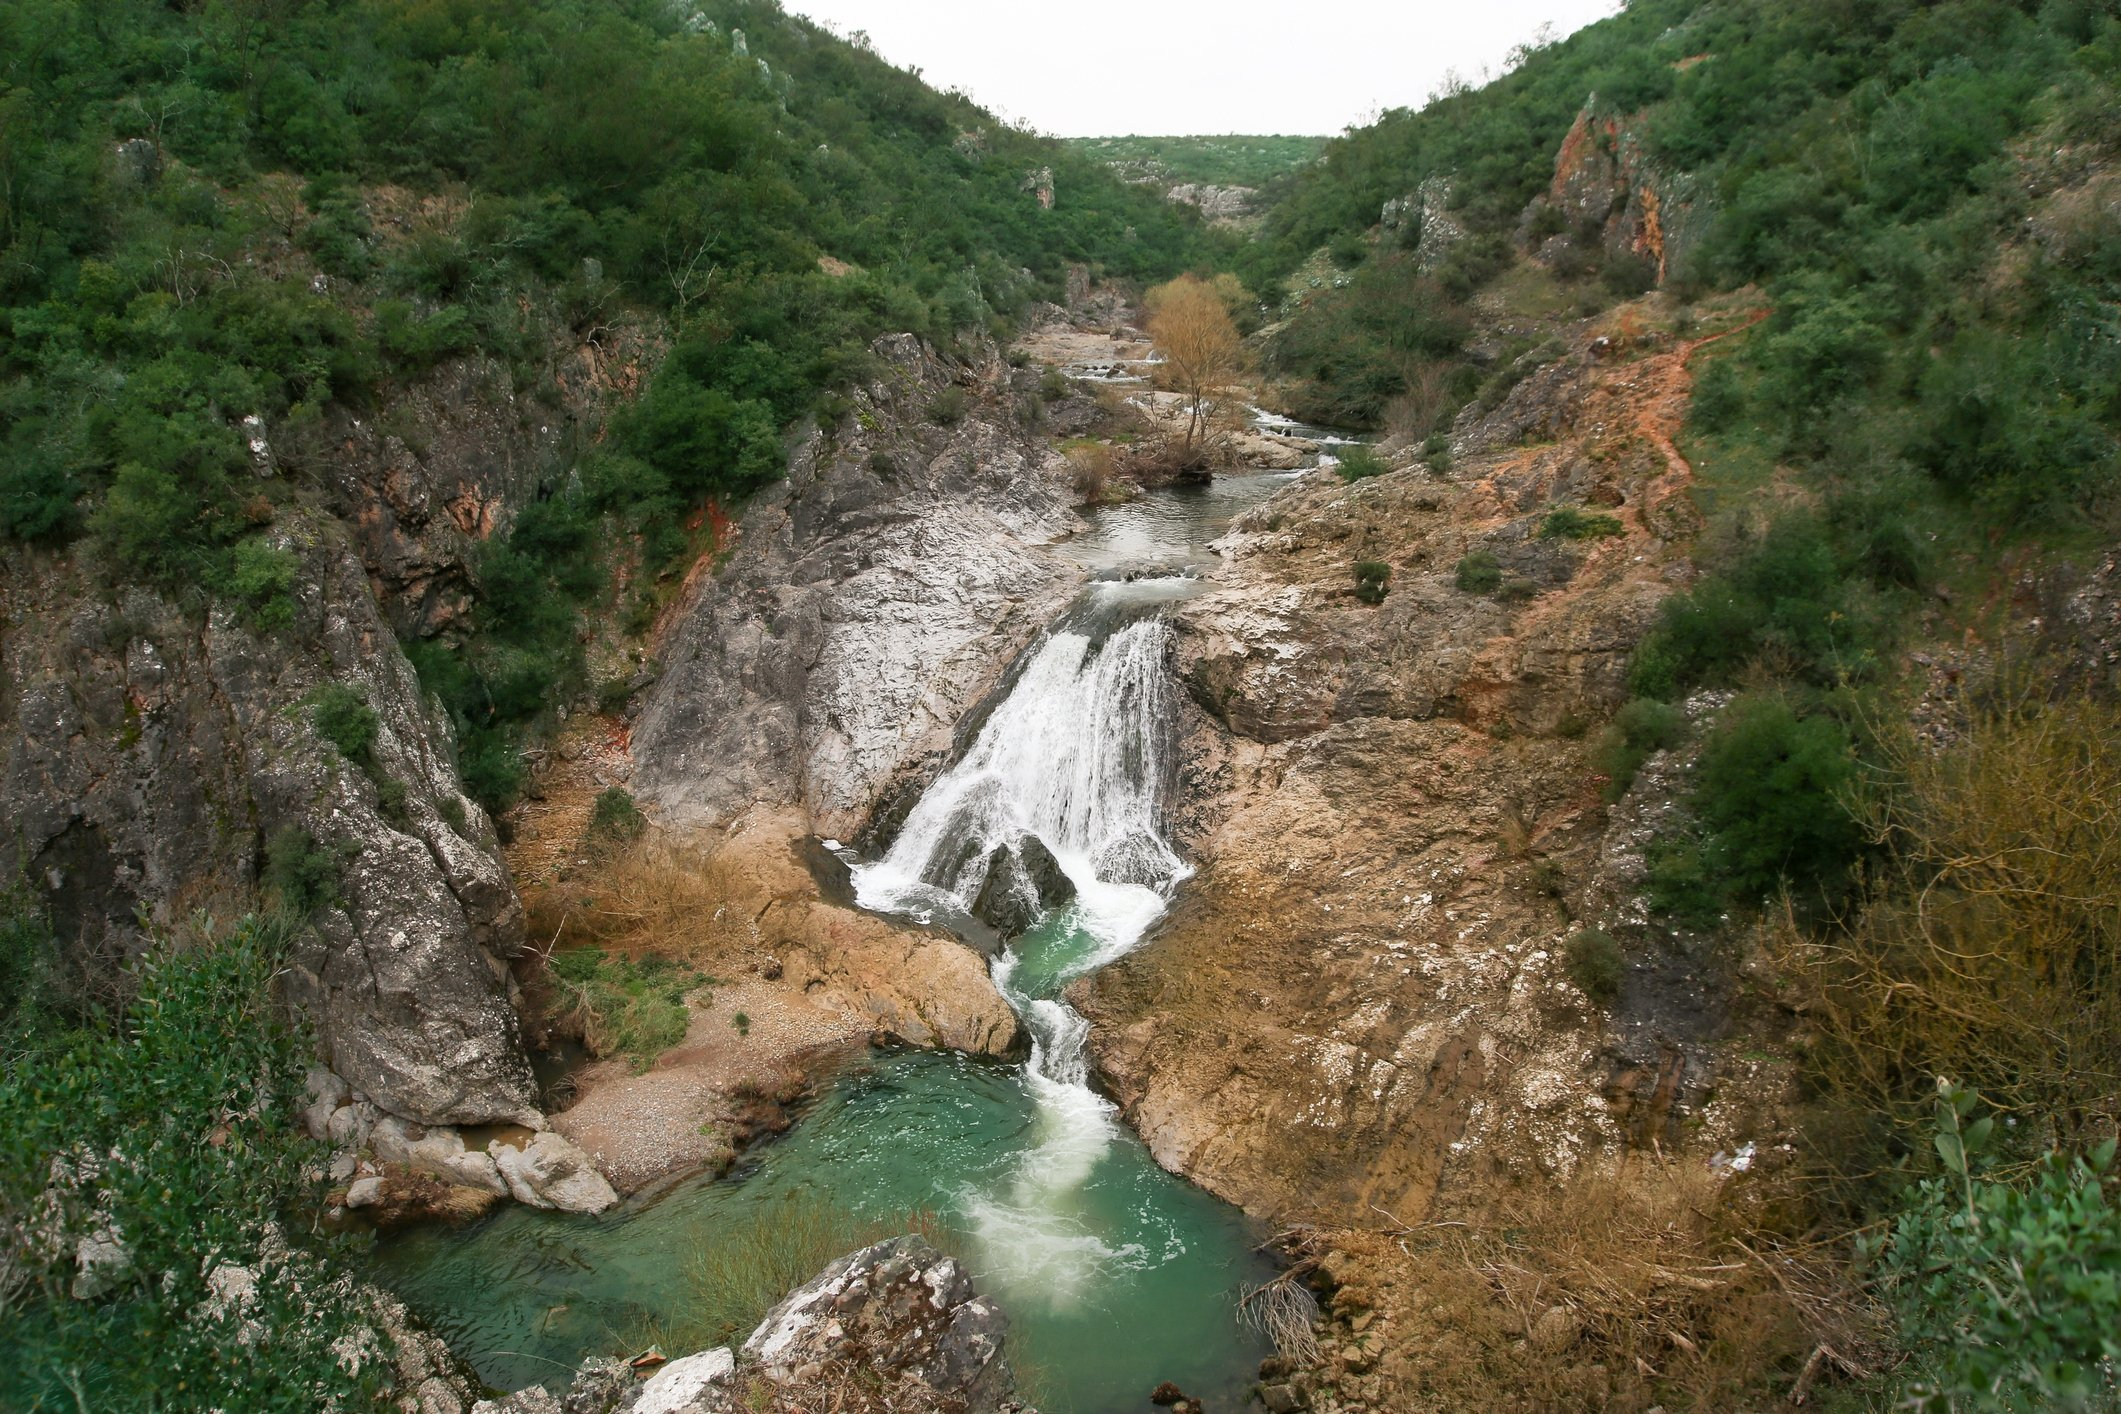 Fossen ved Ballıkayalar Canyon i nordvestlige Kocaeli-provinsen gir en flott foto-op.  (iStock Photo)